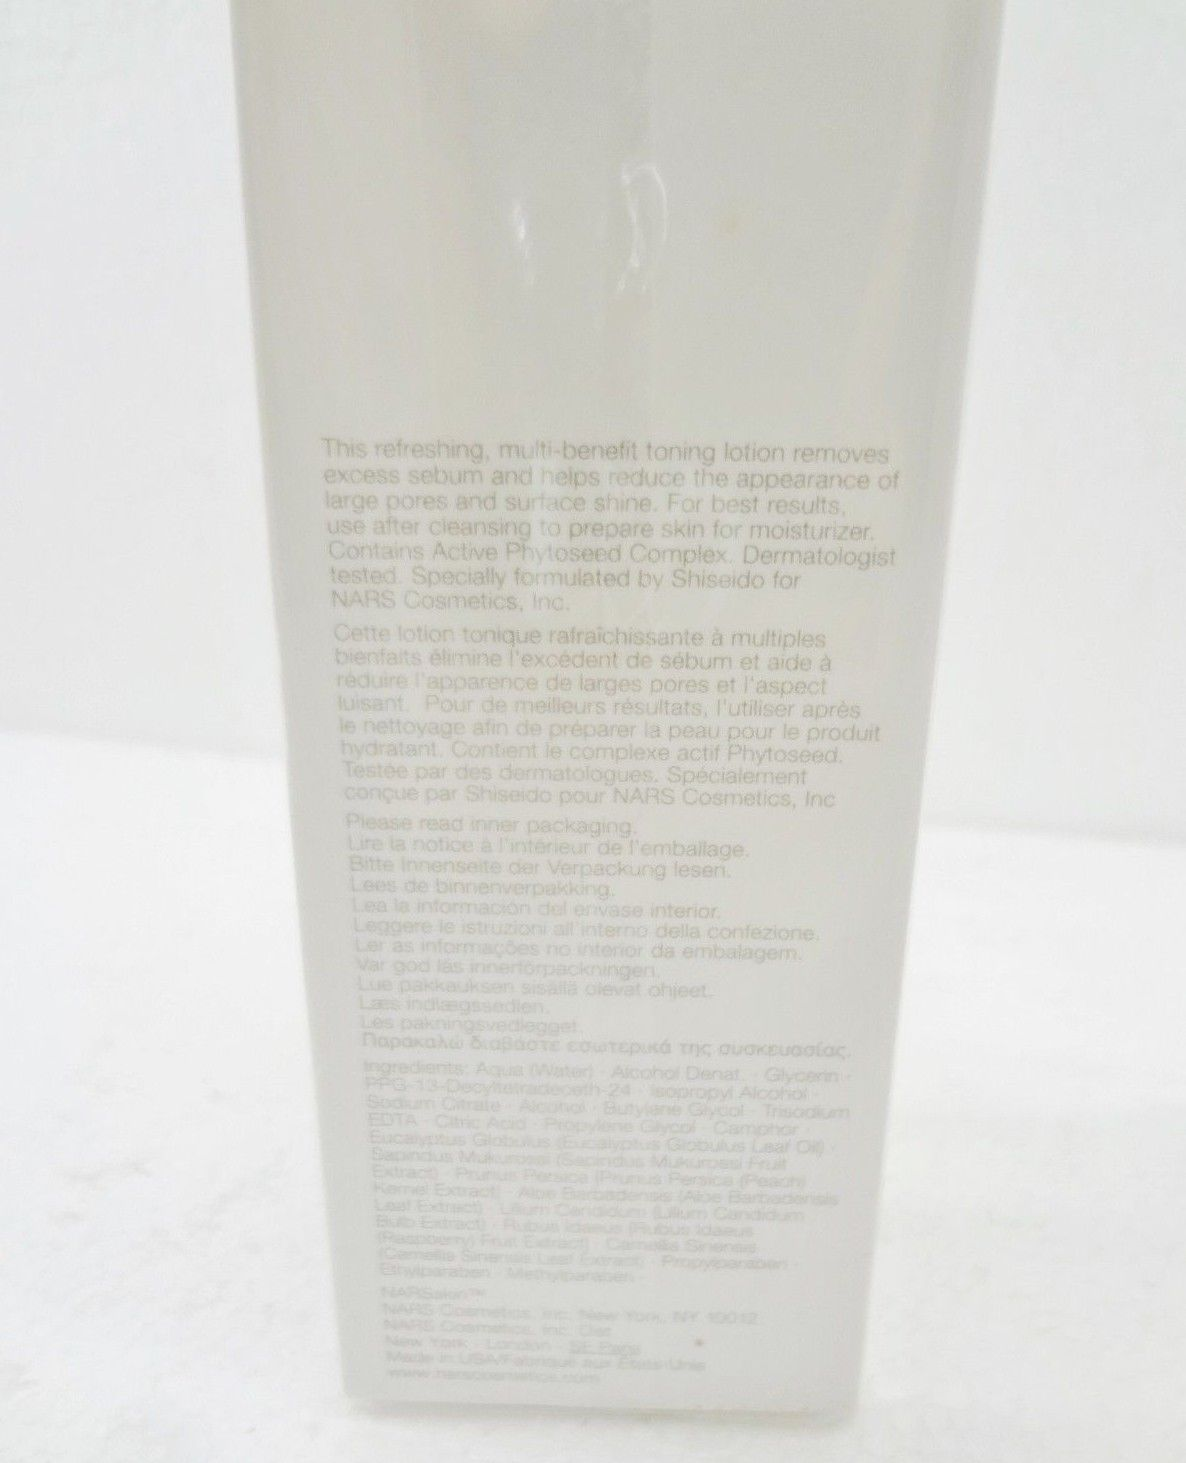 Nars Skin Balancing Toning Lotion 6.7 oz 200ml NEW